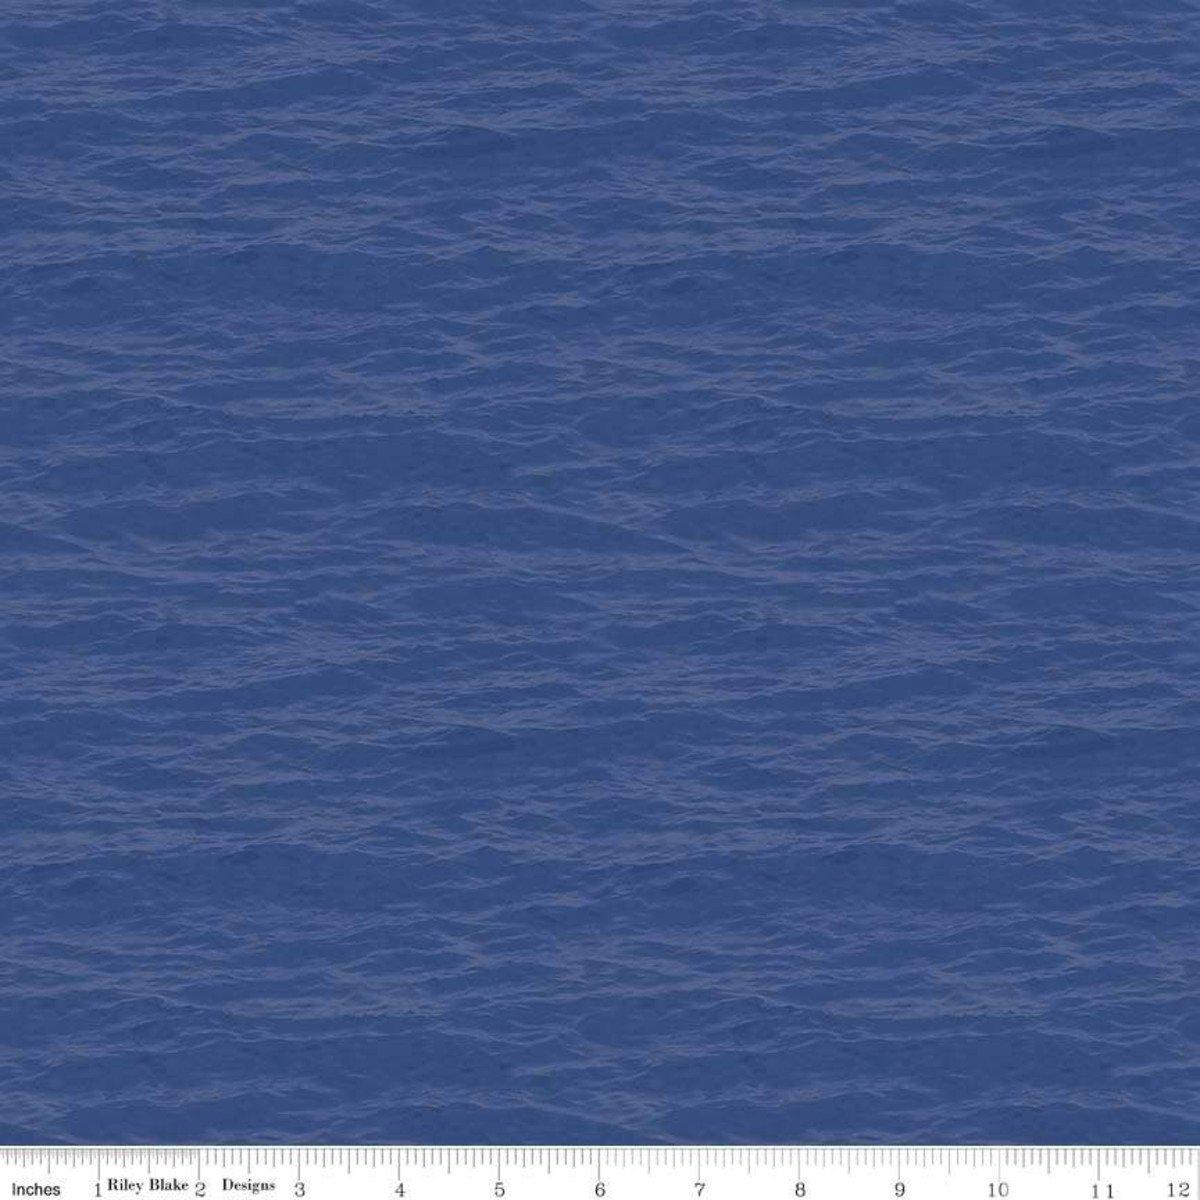 Lake Blue Water - Fish and Fowl - C8731-LAKEBLUE